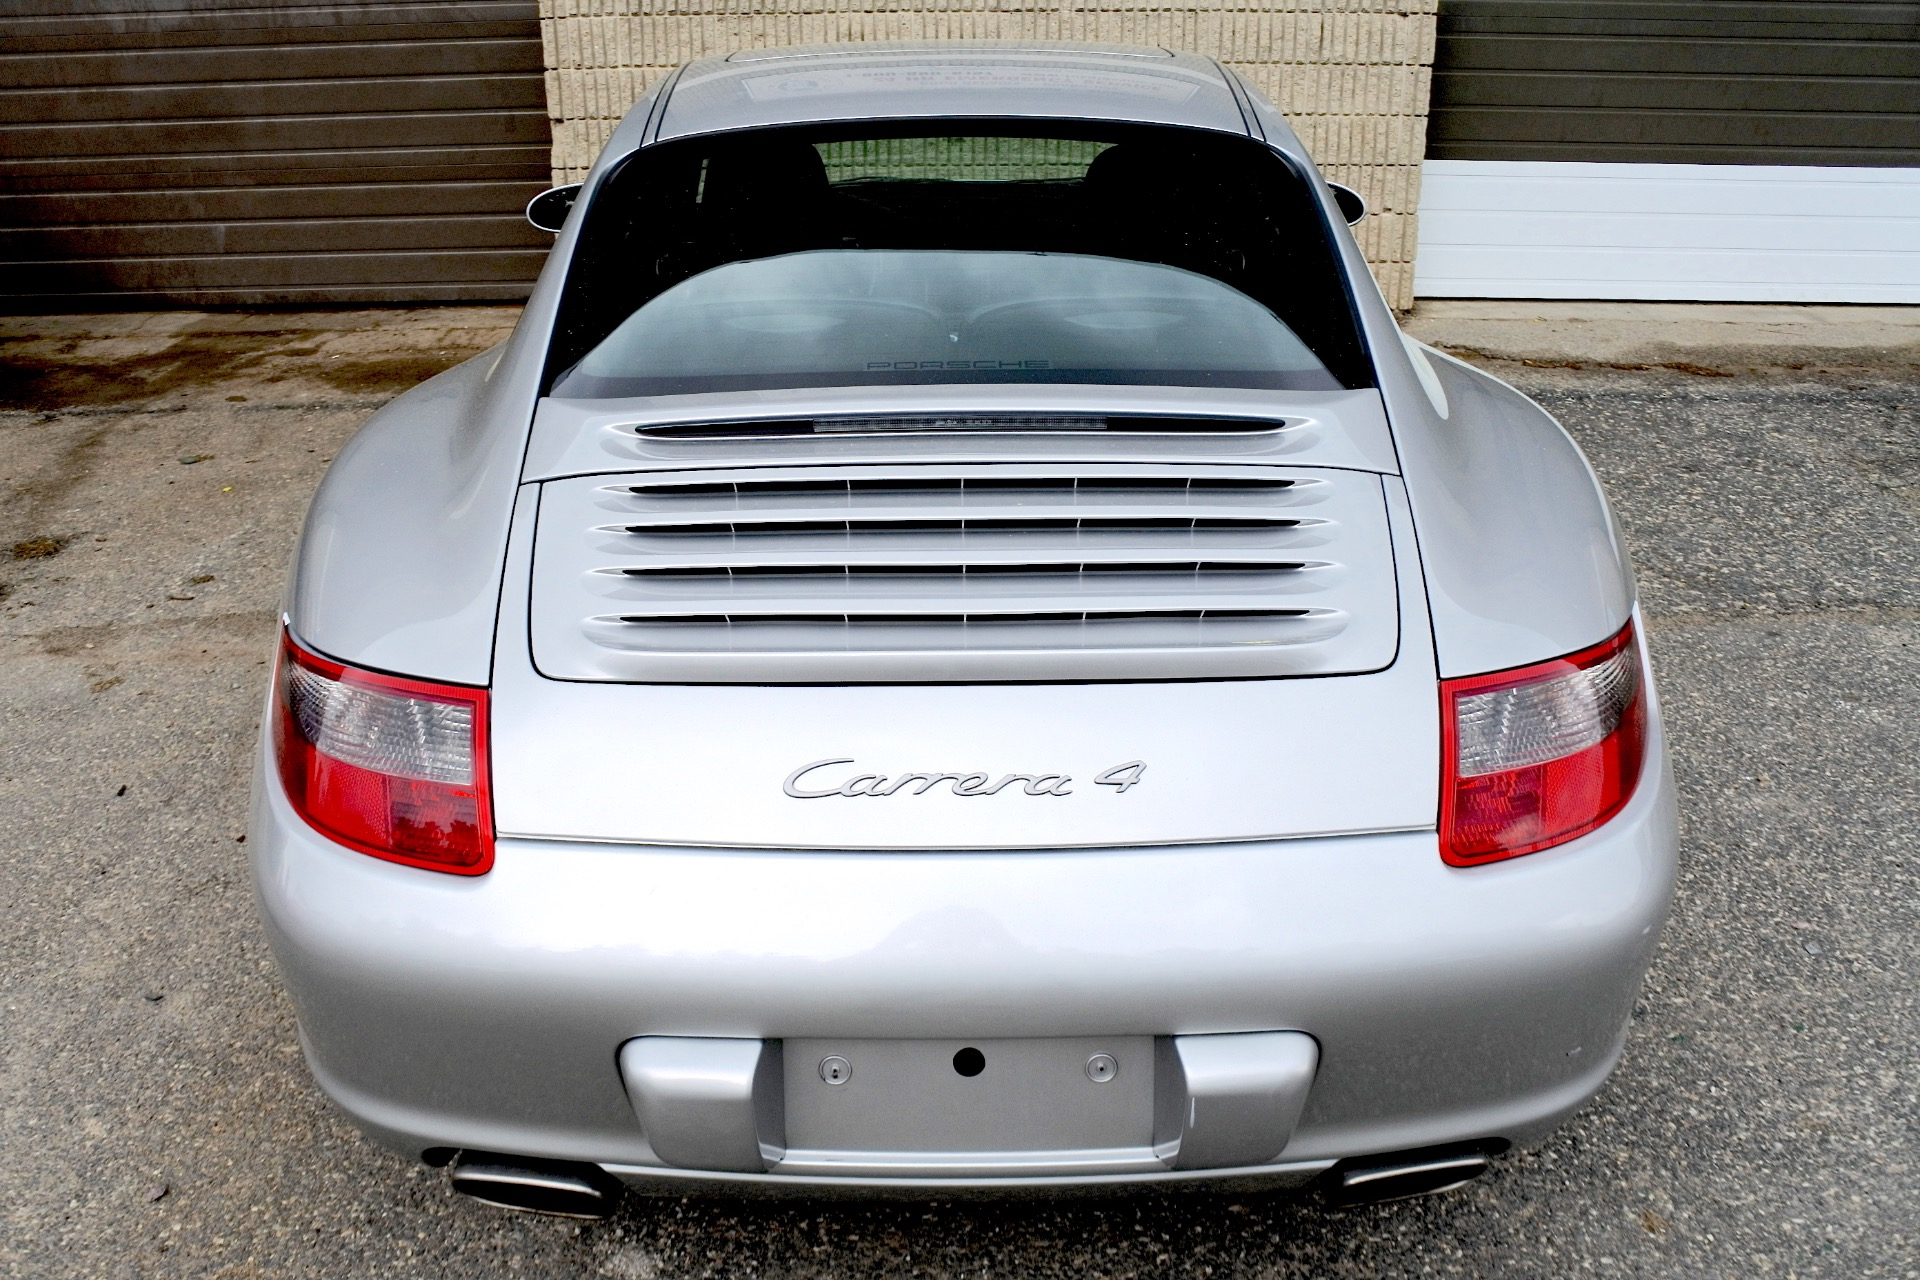 Used 2006 Porsche 911 Carrera 4 Used 2006 Porsche 911 Carrera 4 for sale  at Metro West Motorcars LLC in Shrewsbury MA 4